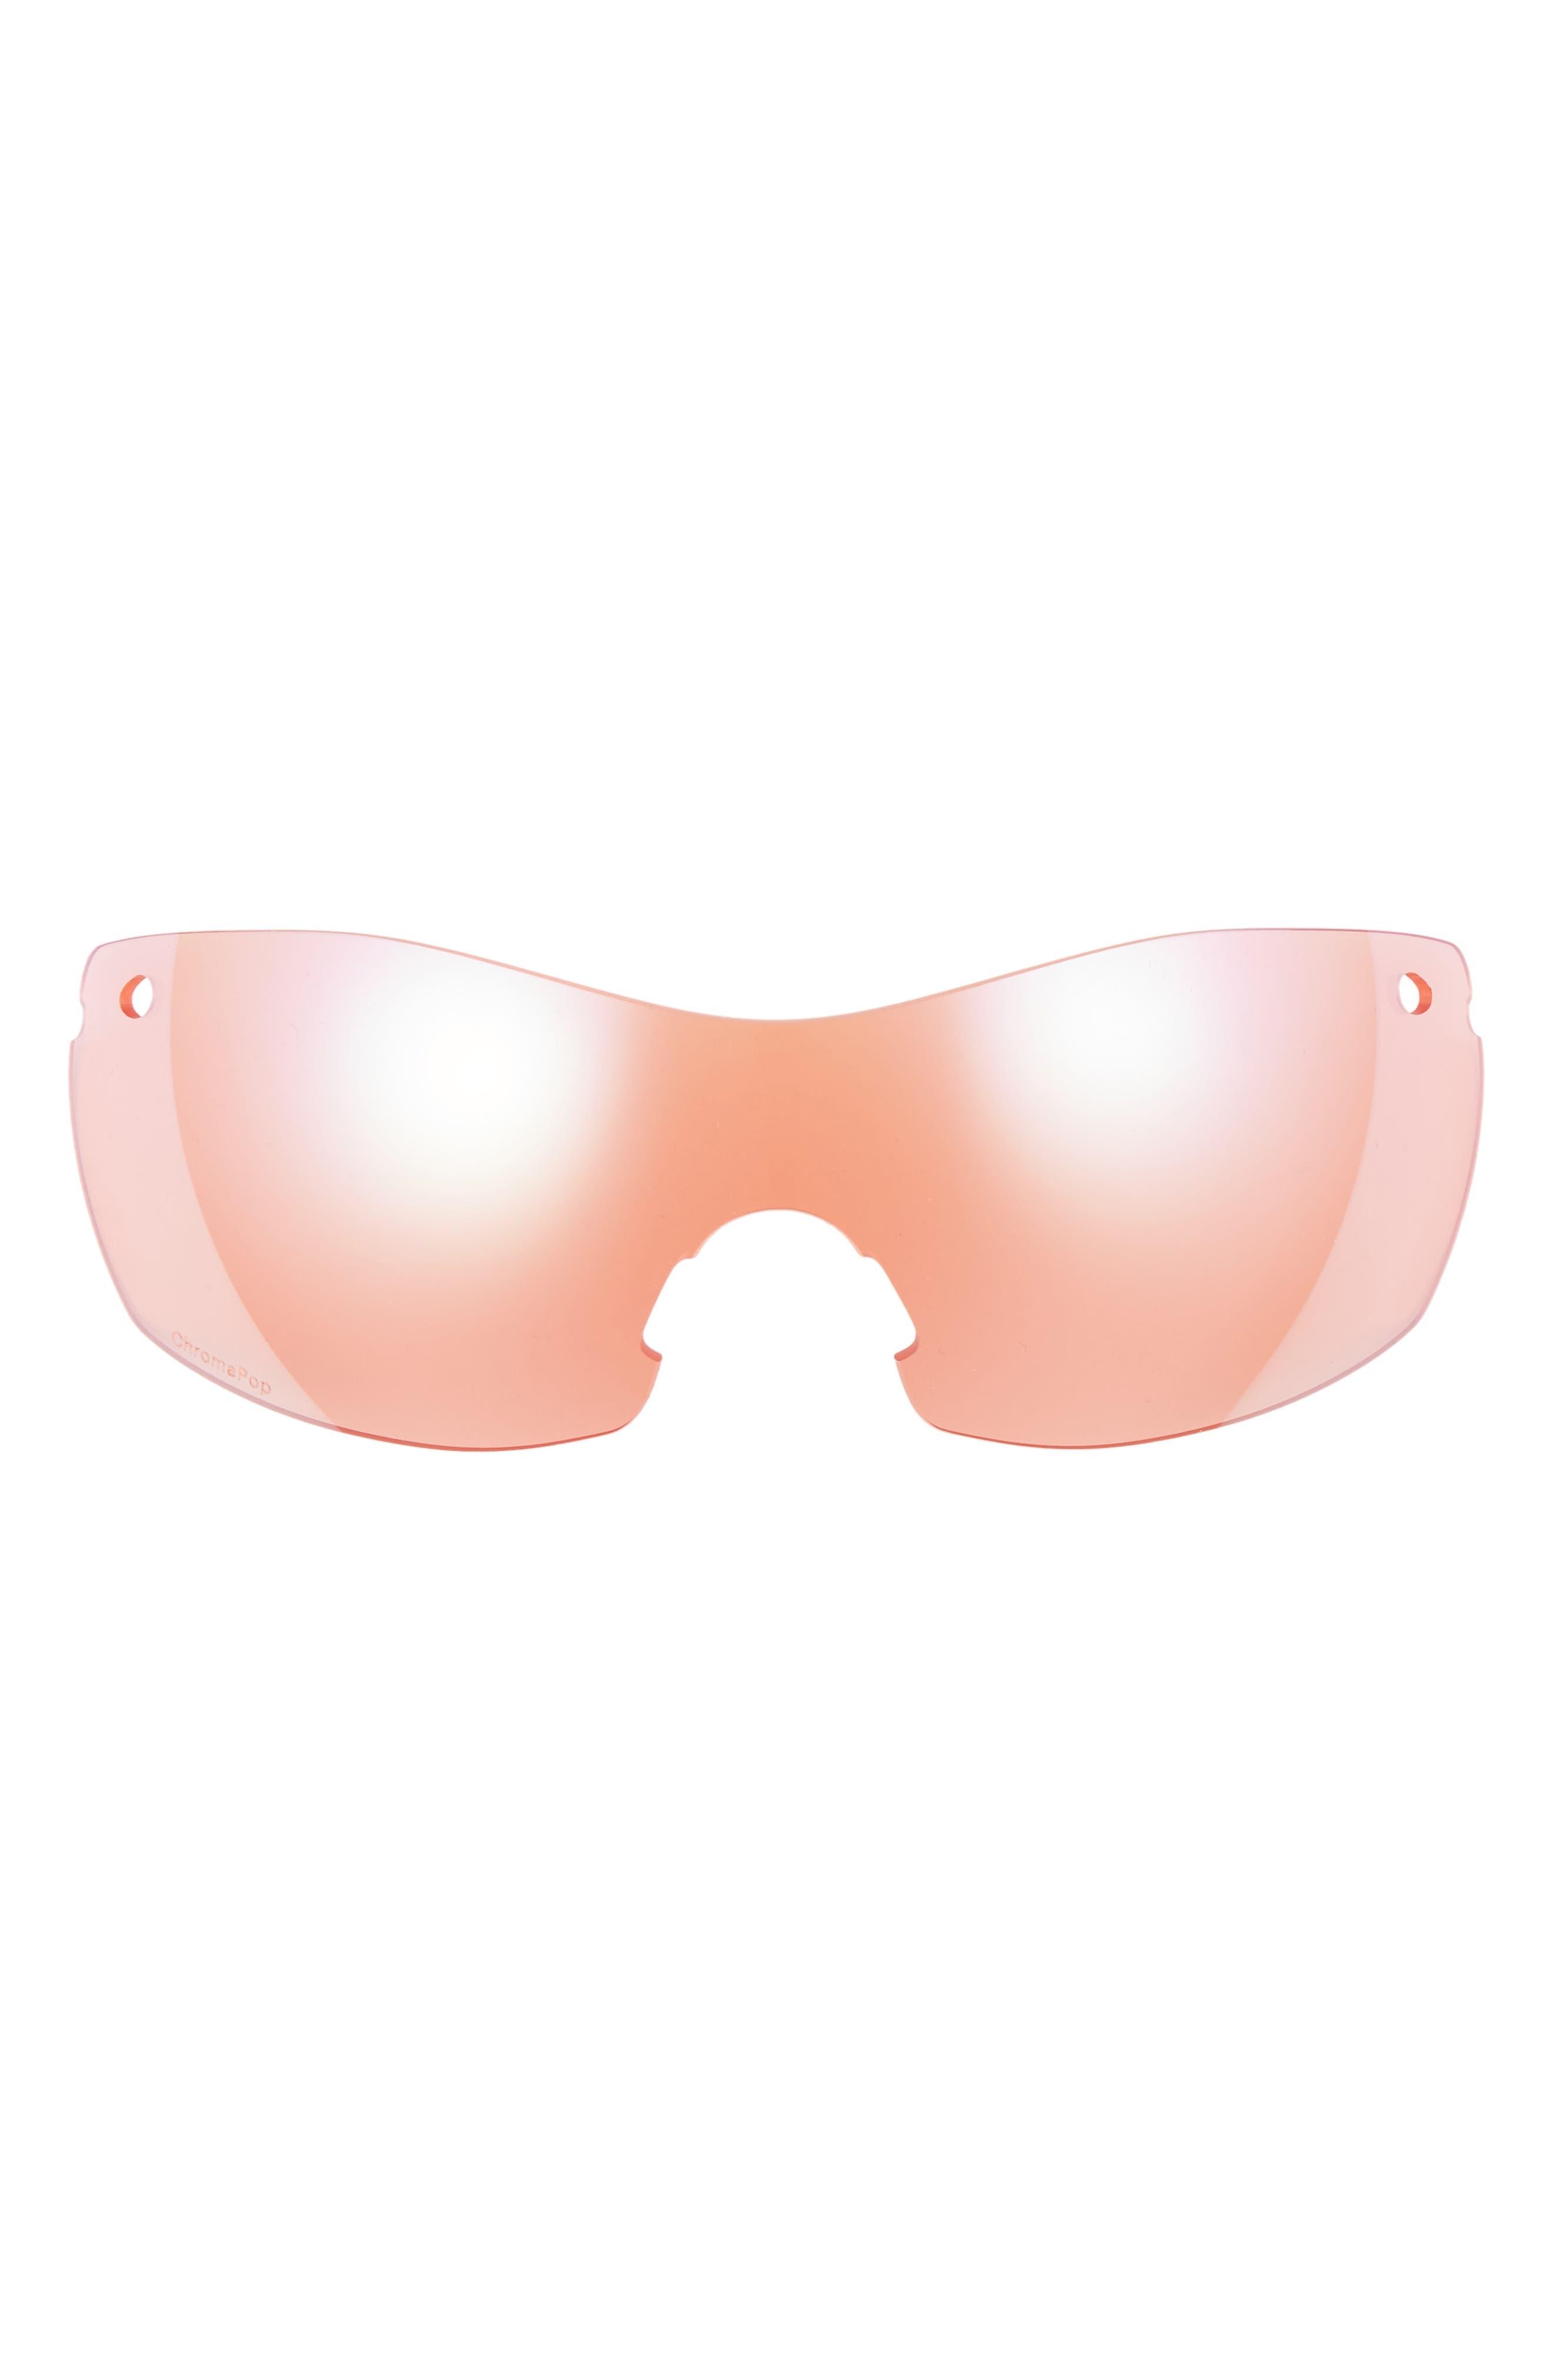 PivLock<sup>™</sup> Asana 150mm ChromaPop Polarized Sunglasses,                             Alternate thumbnail 18, color,